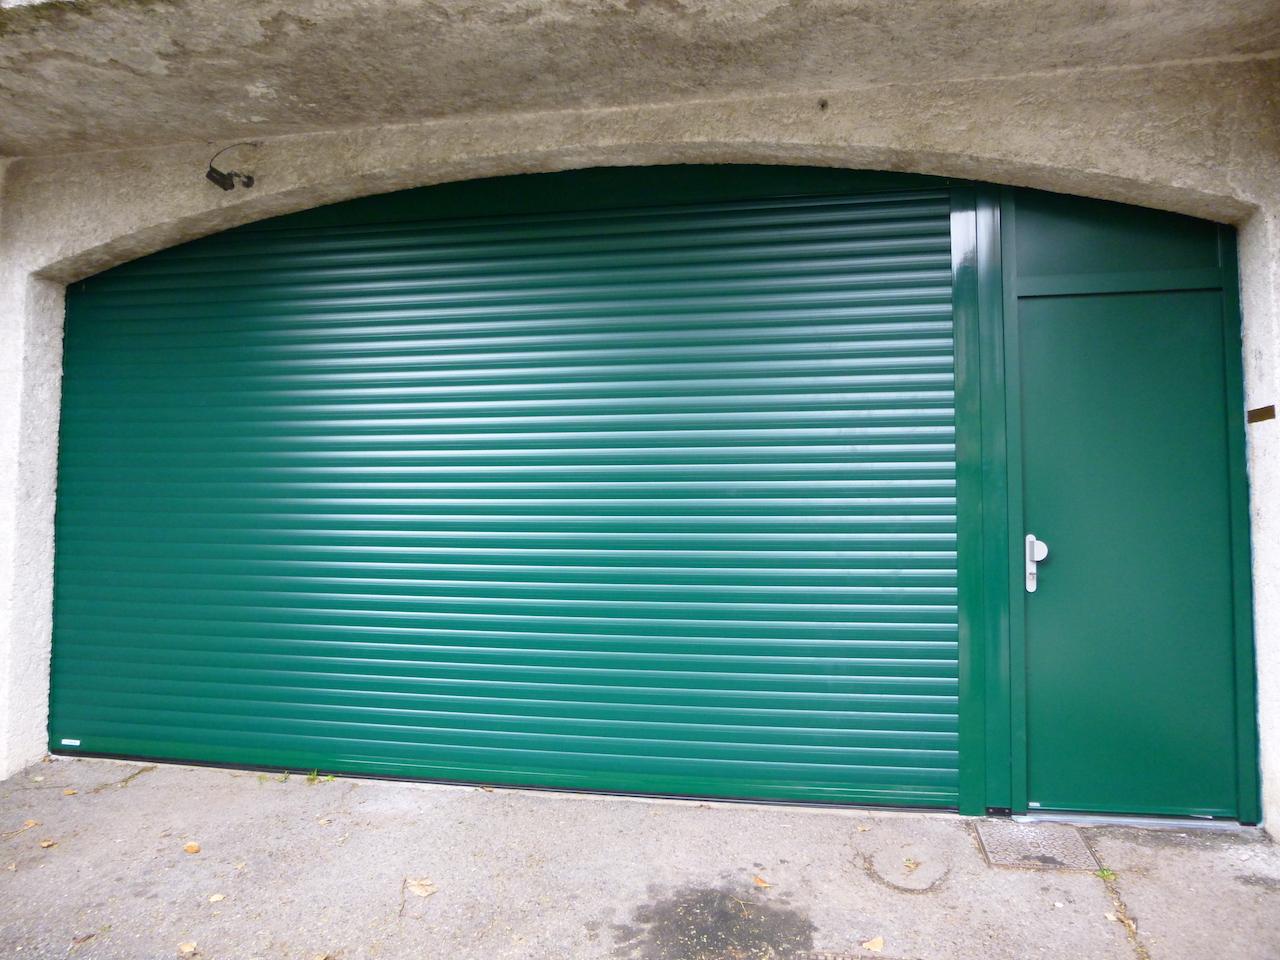 Porte-de-garage-enroulable-avec-porte-de -service